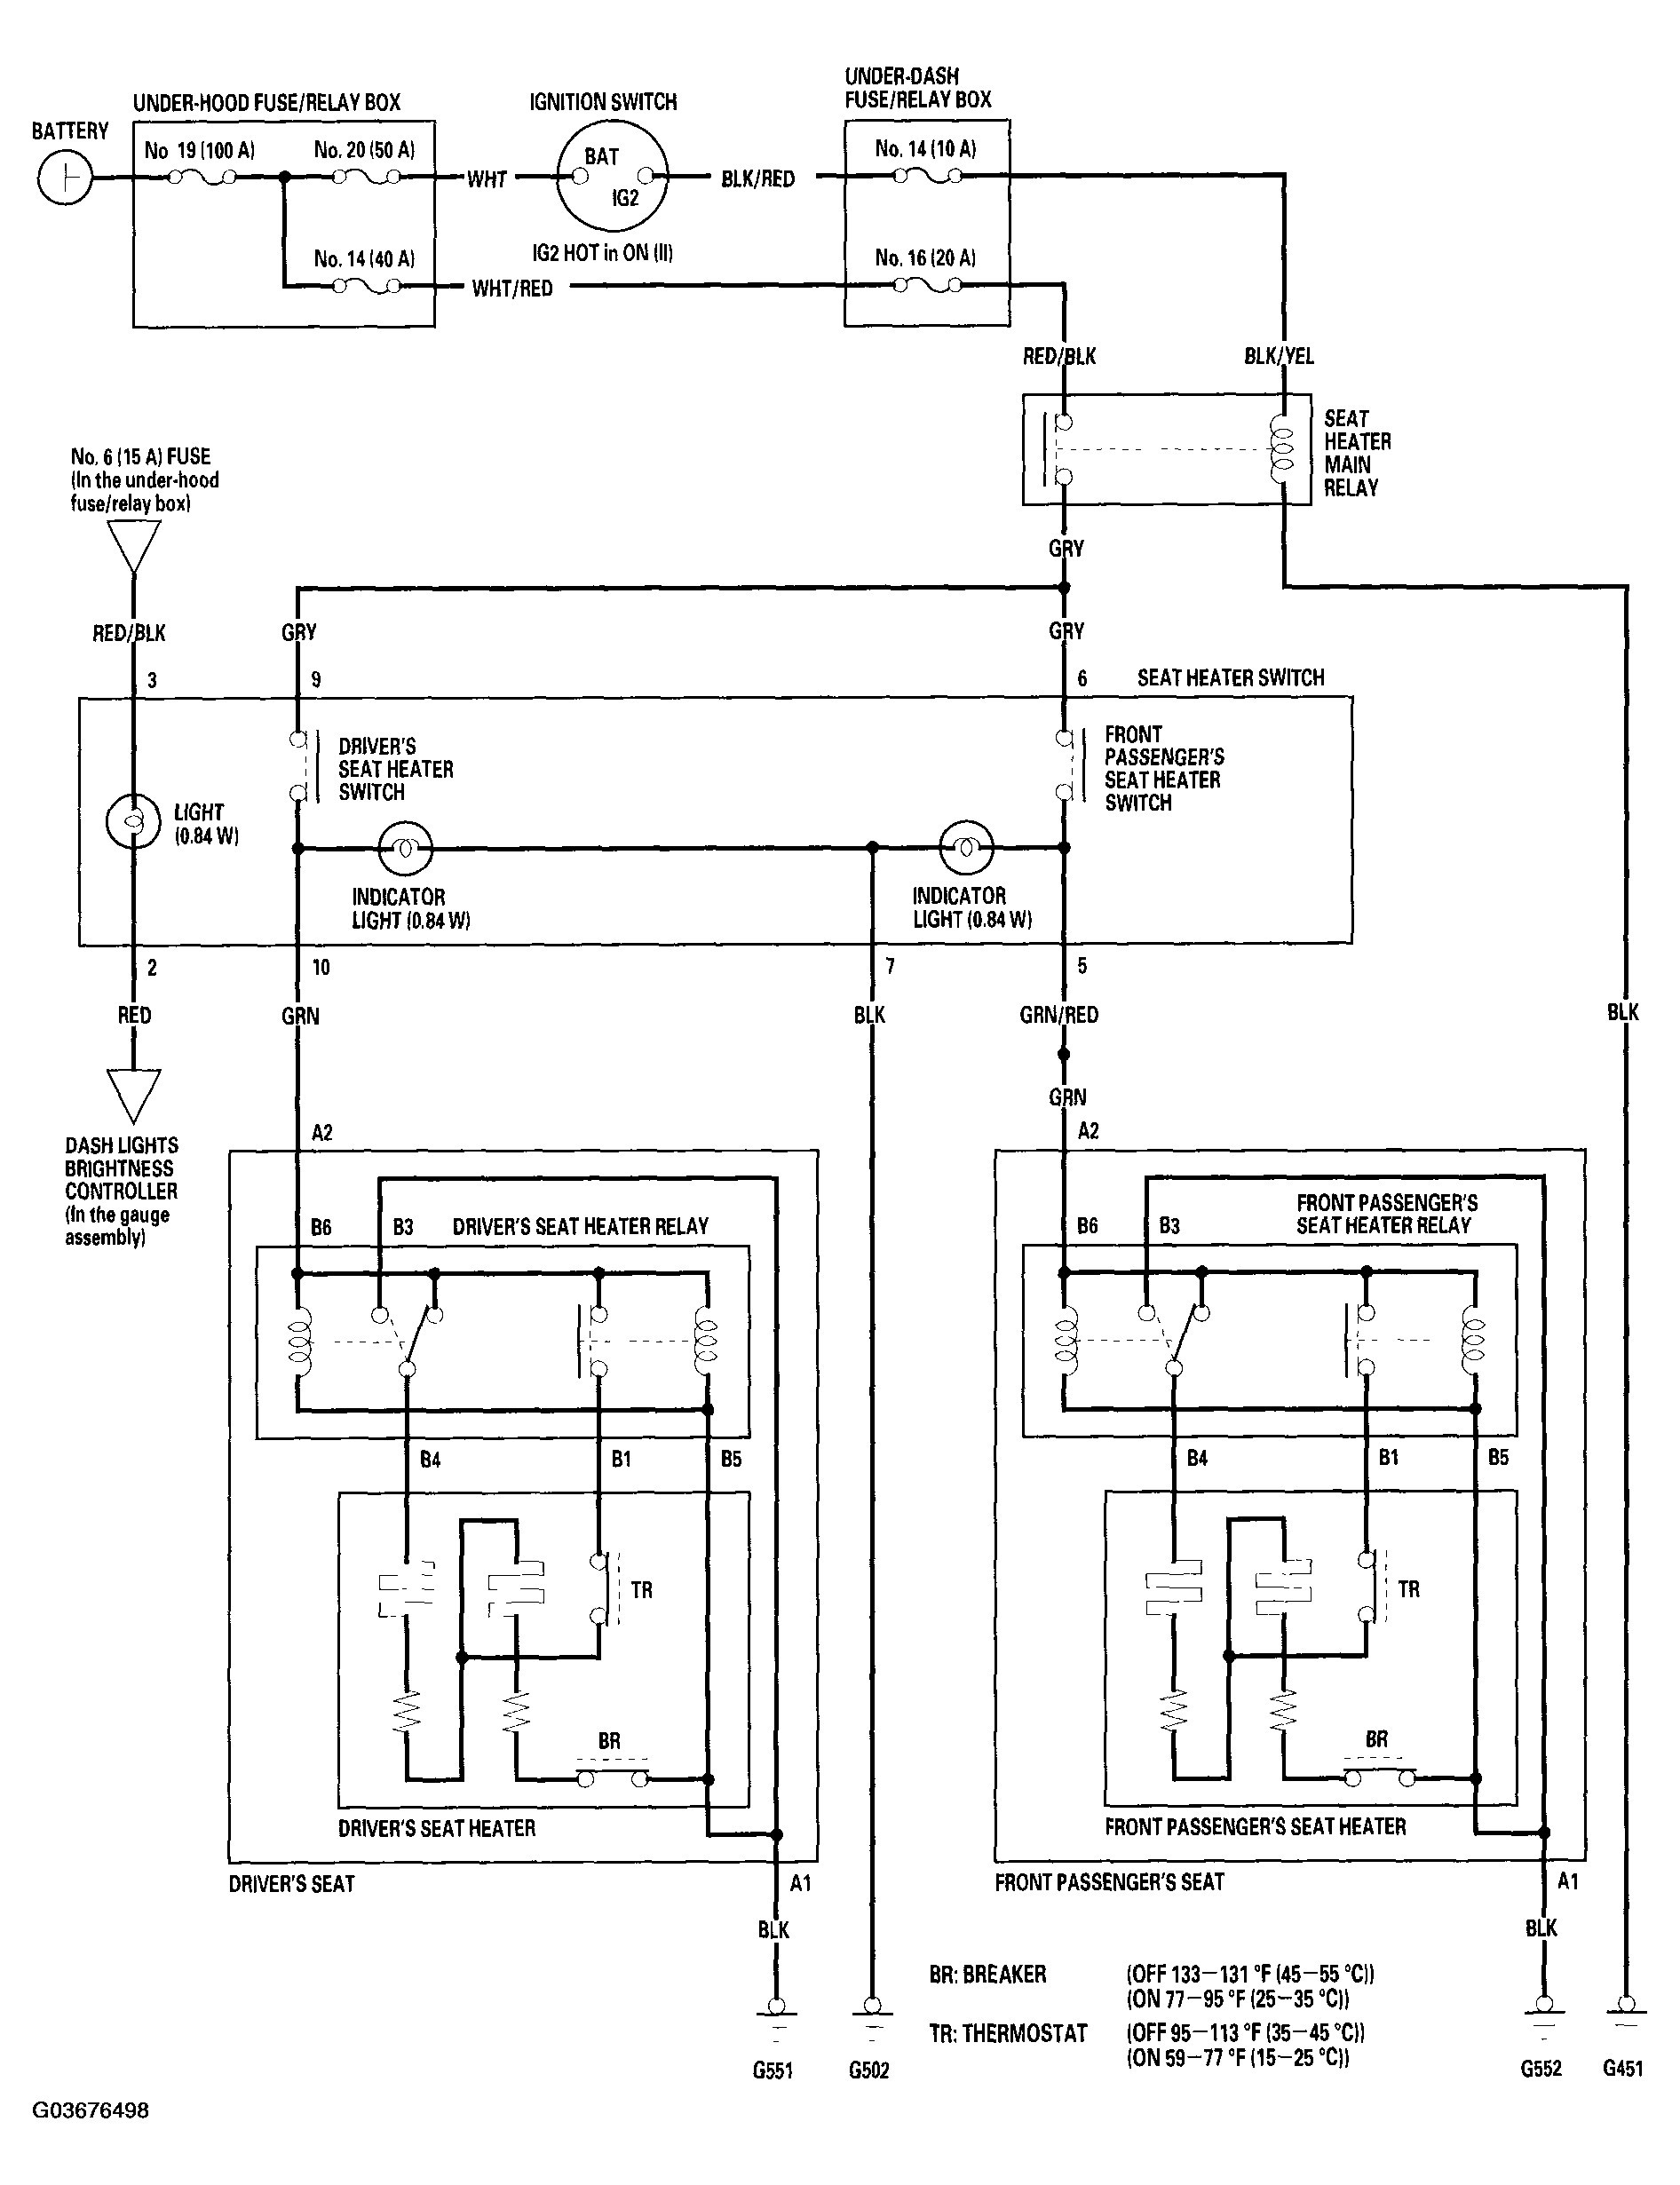 1993 honda accord engine diagram 1995 honda accord engine diagram cr b-series coolant diagram 1993 honda accord engine diagram 1995 honda accord engine diagram cr v fuse box diagram besides